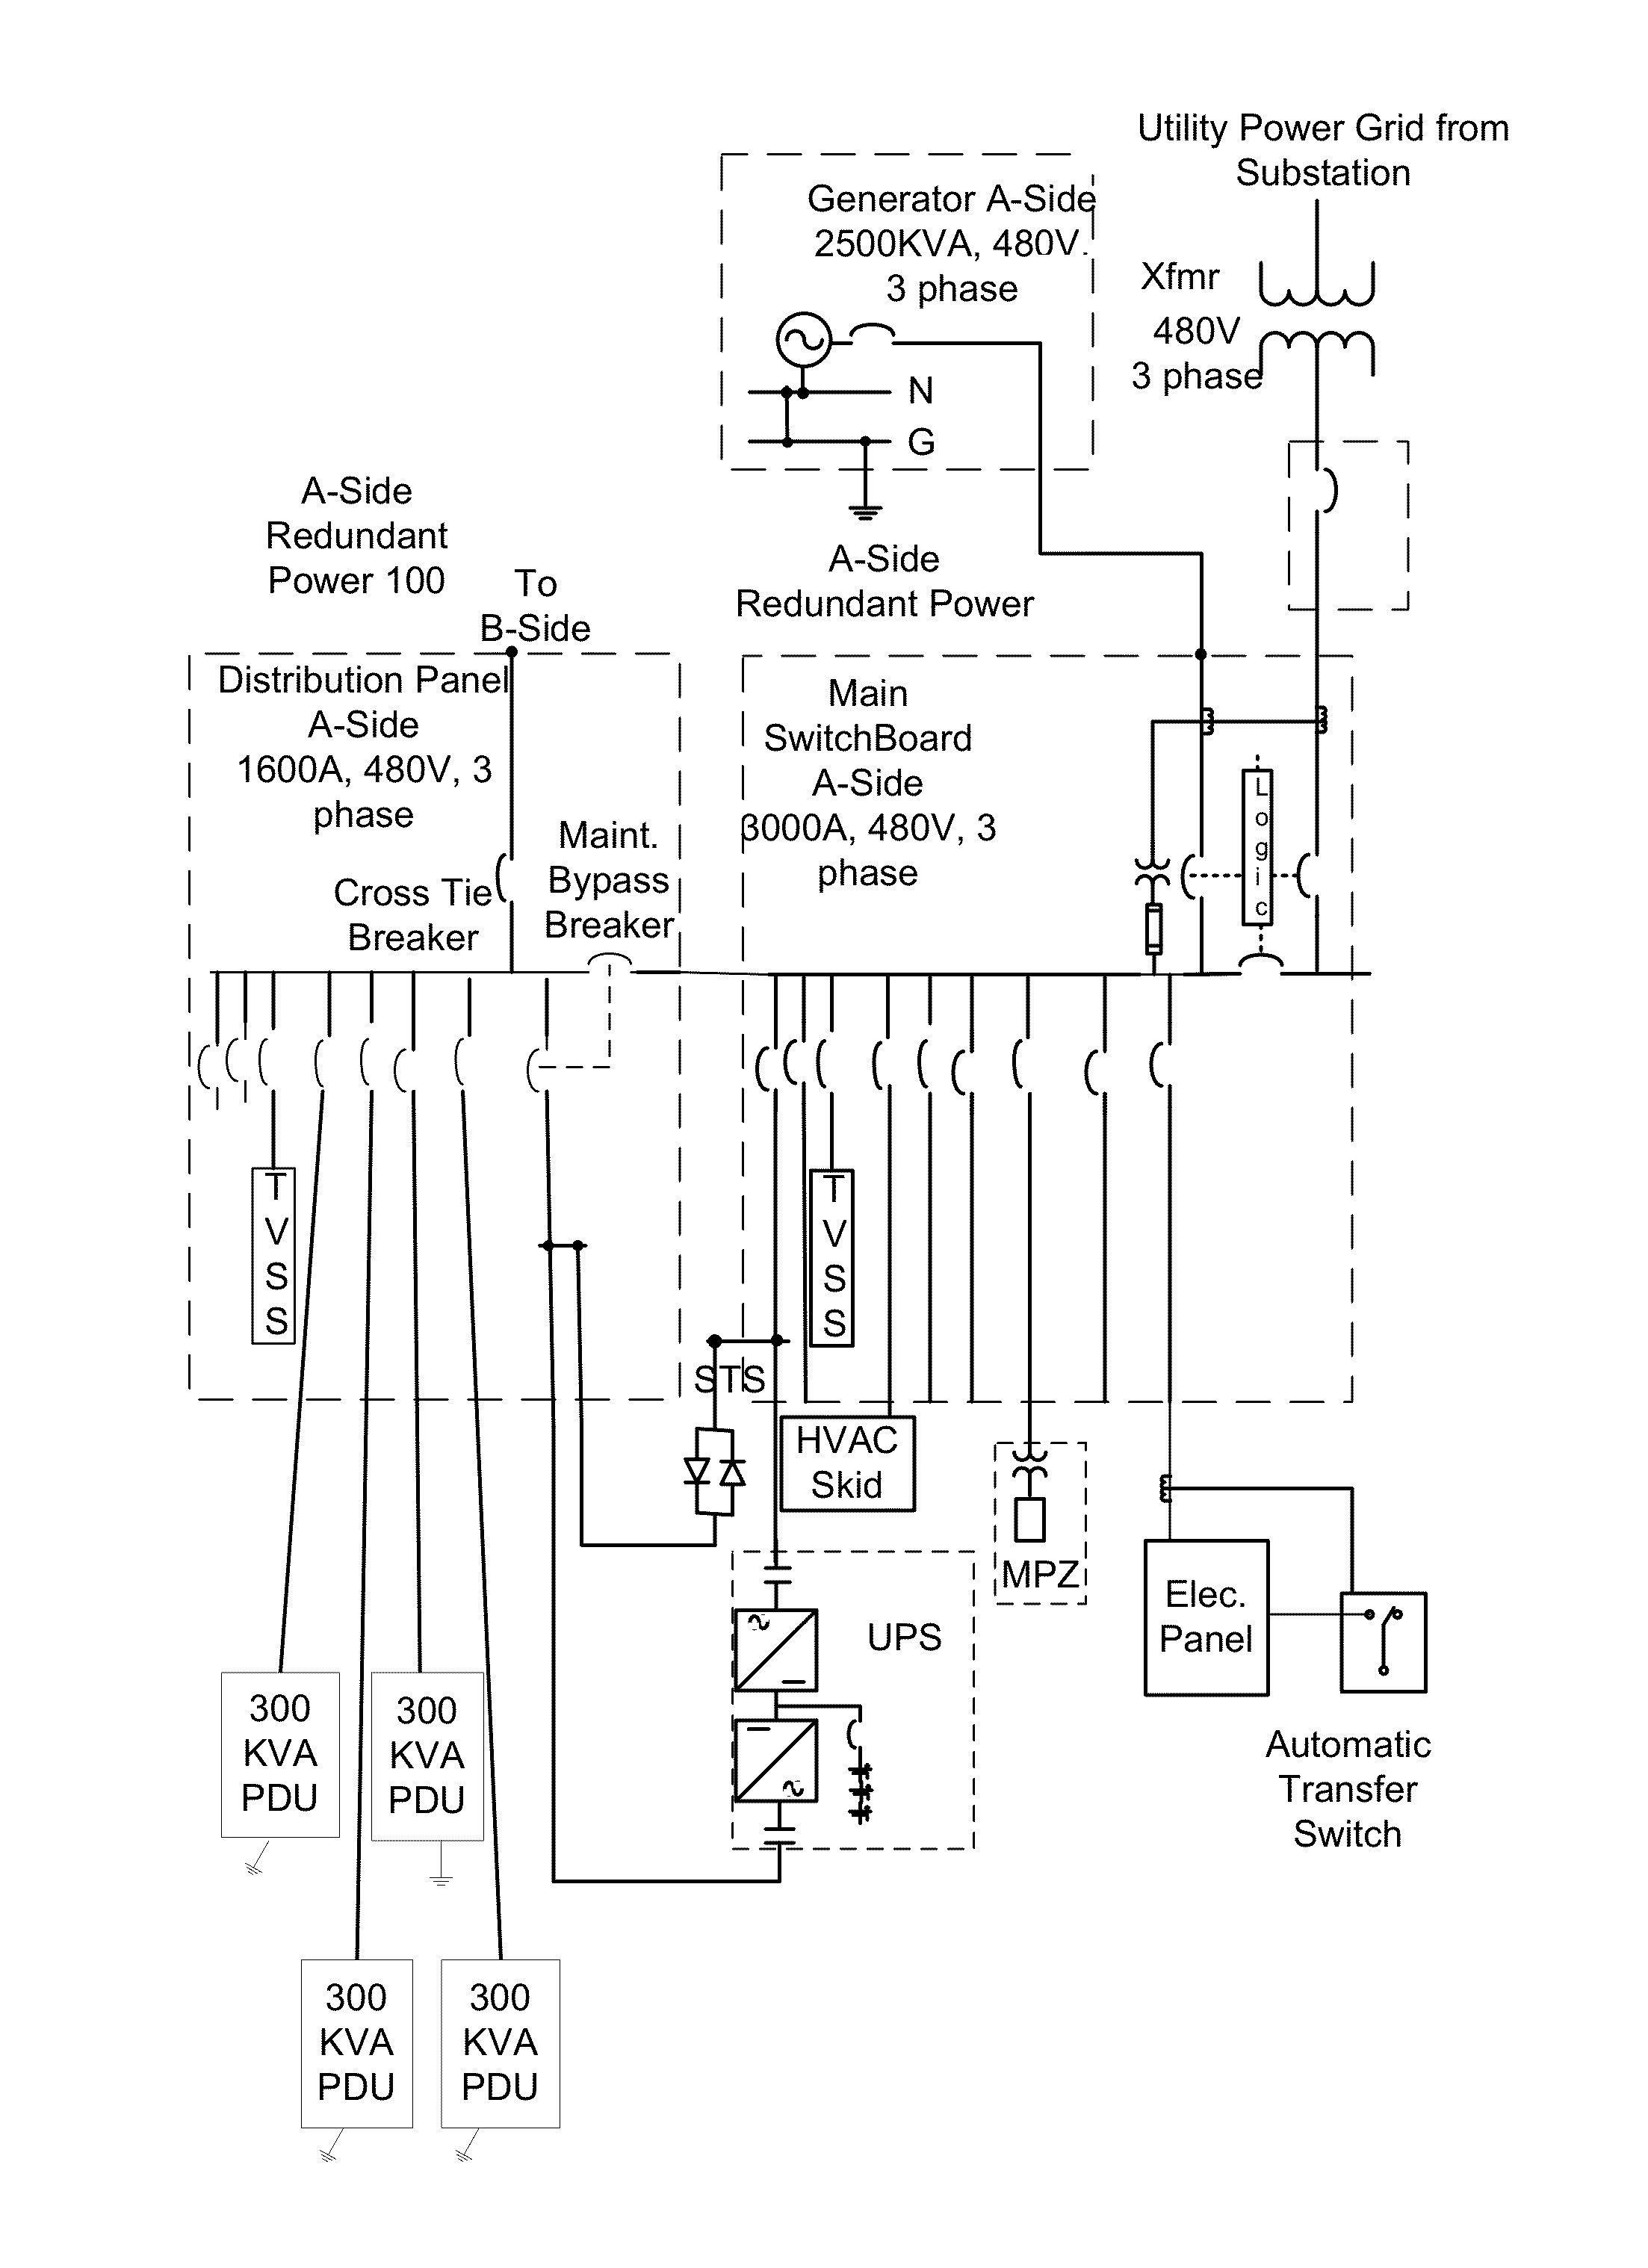 Elegant Wiring Diagram Astra H Diagrams Digramssample Diagramimages Wiringdiagramsample Wiringdiagram Circuit Diagram Diagram Lighting Diagram